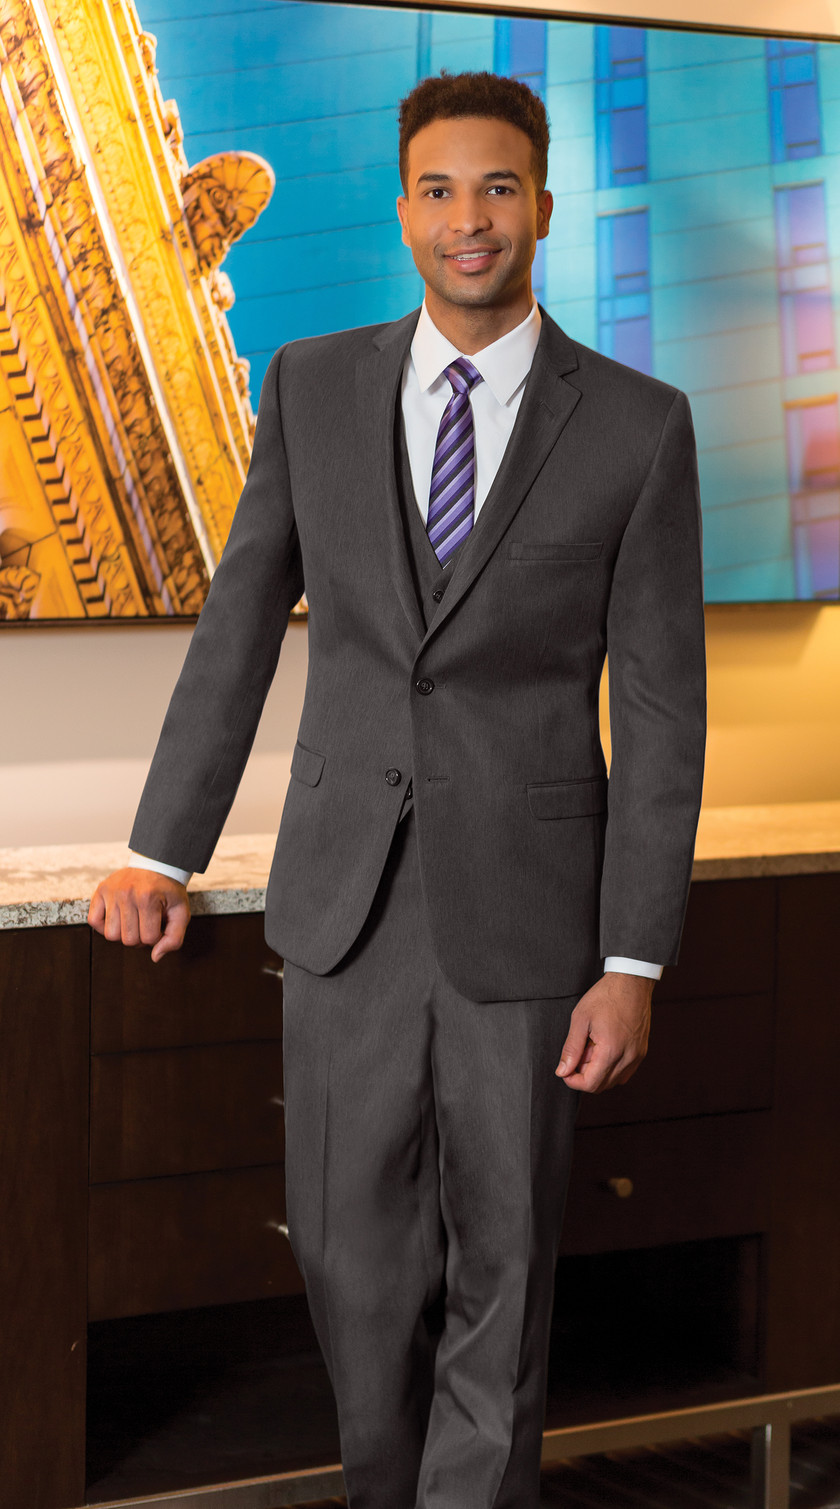 Charcoal grey suit purchase buy retail vest Phoenix Tempe Mesa Gilbert Glendale Peoria Scottsdale Arizona